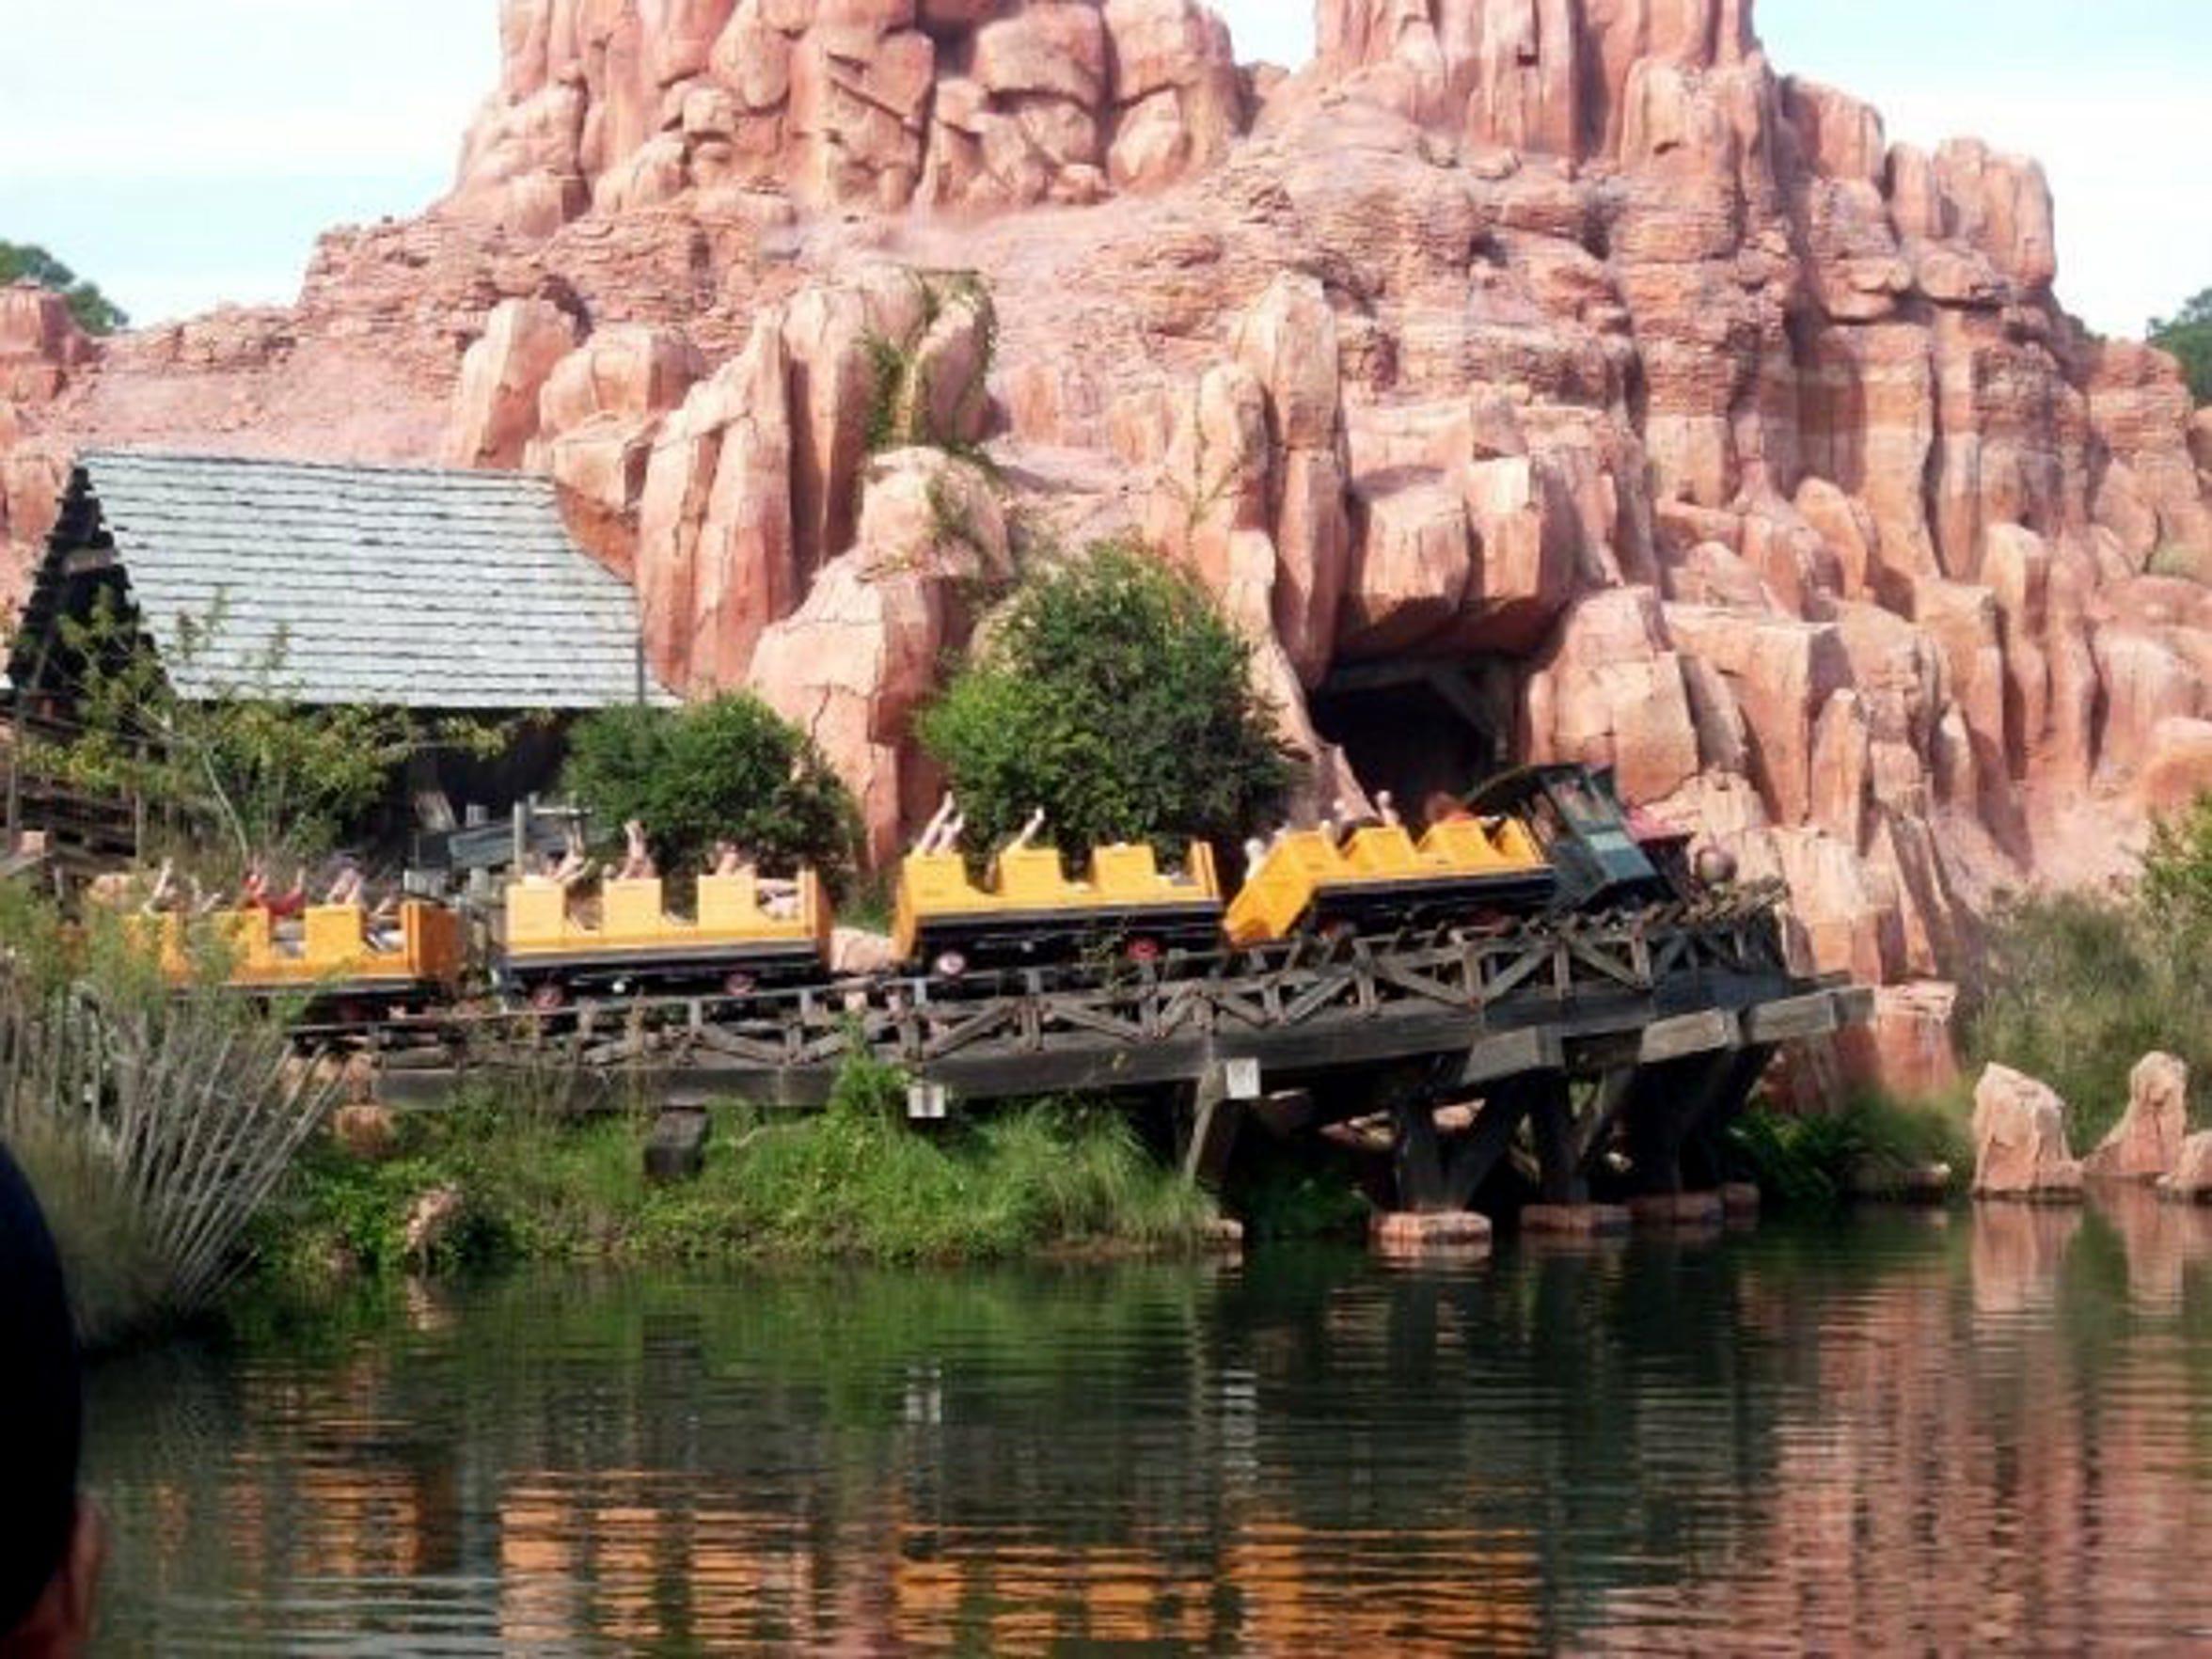 Big Thunder Mountain Railroad is a roller coaster set